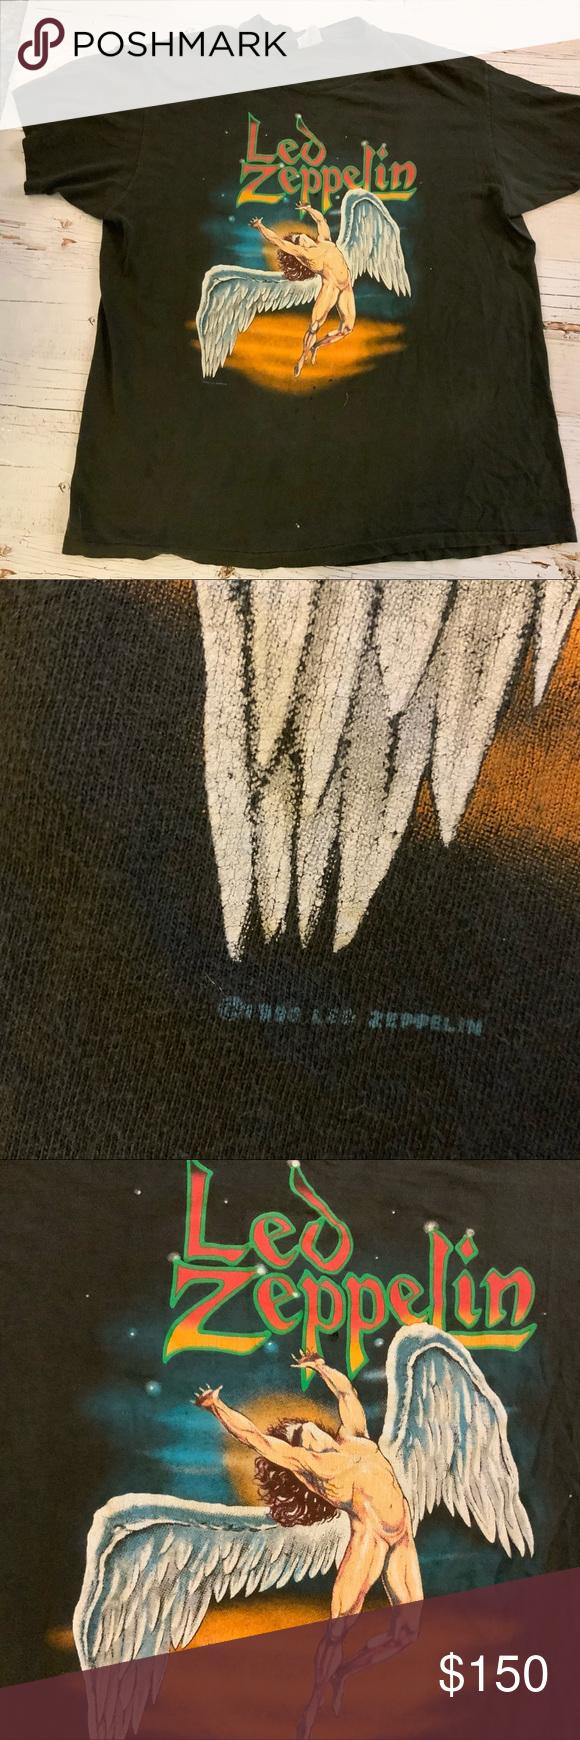 Vintage Led Zeppelin Swan Song 1990 T Shirt Xl Led Zeppelin Zeppelin T Shirts For Women